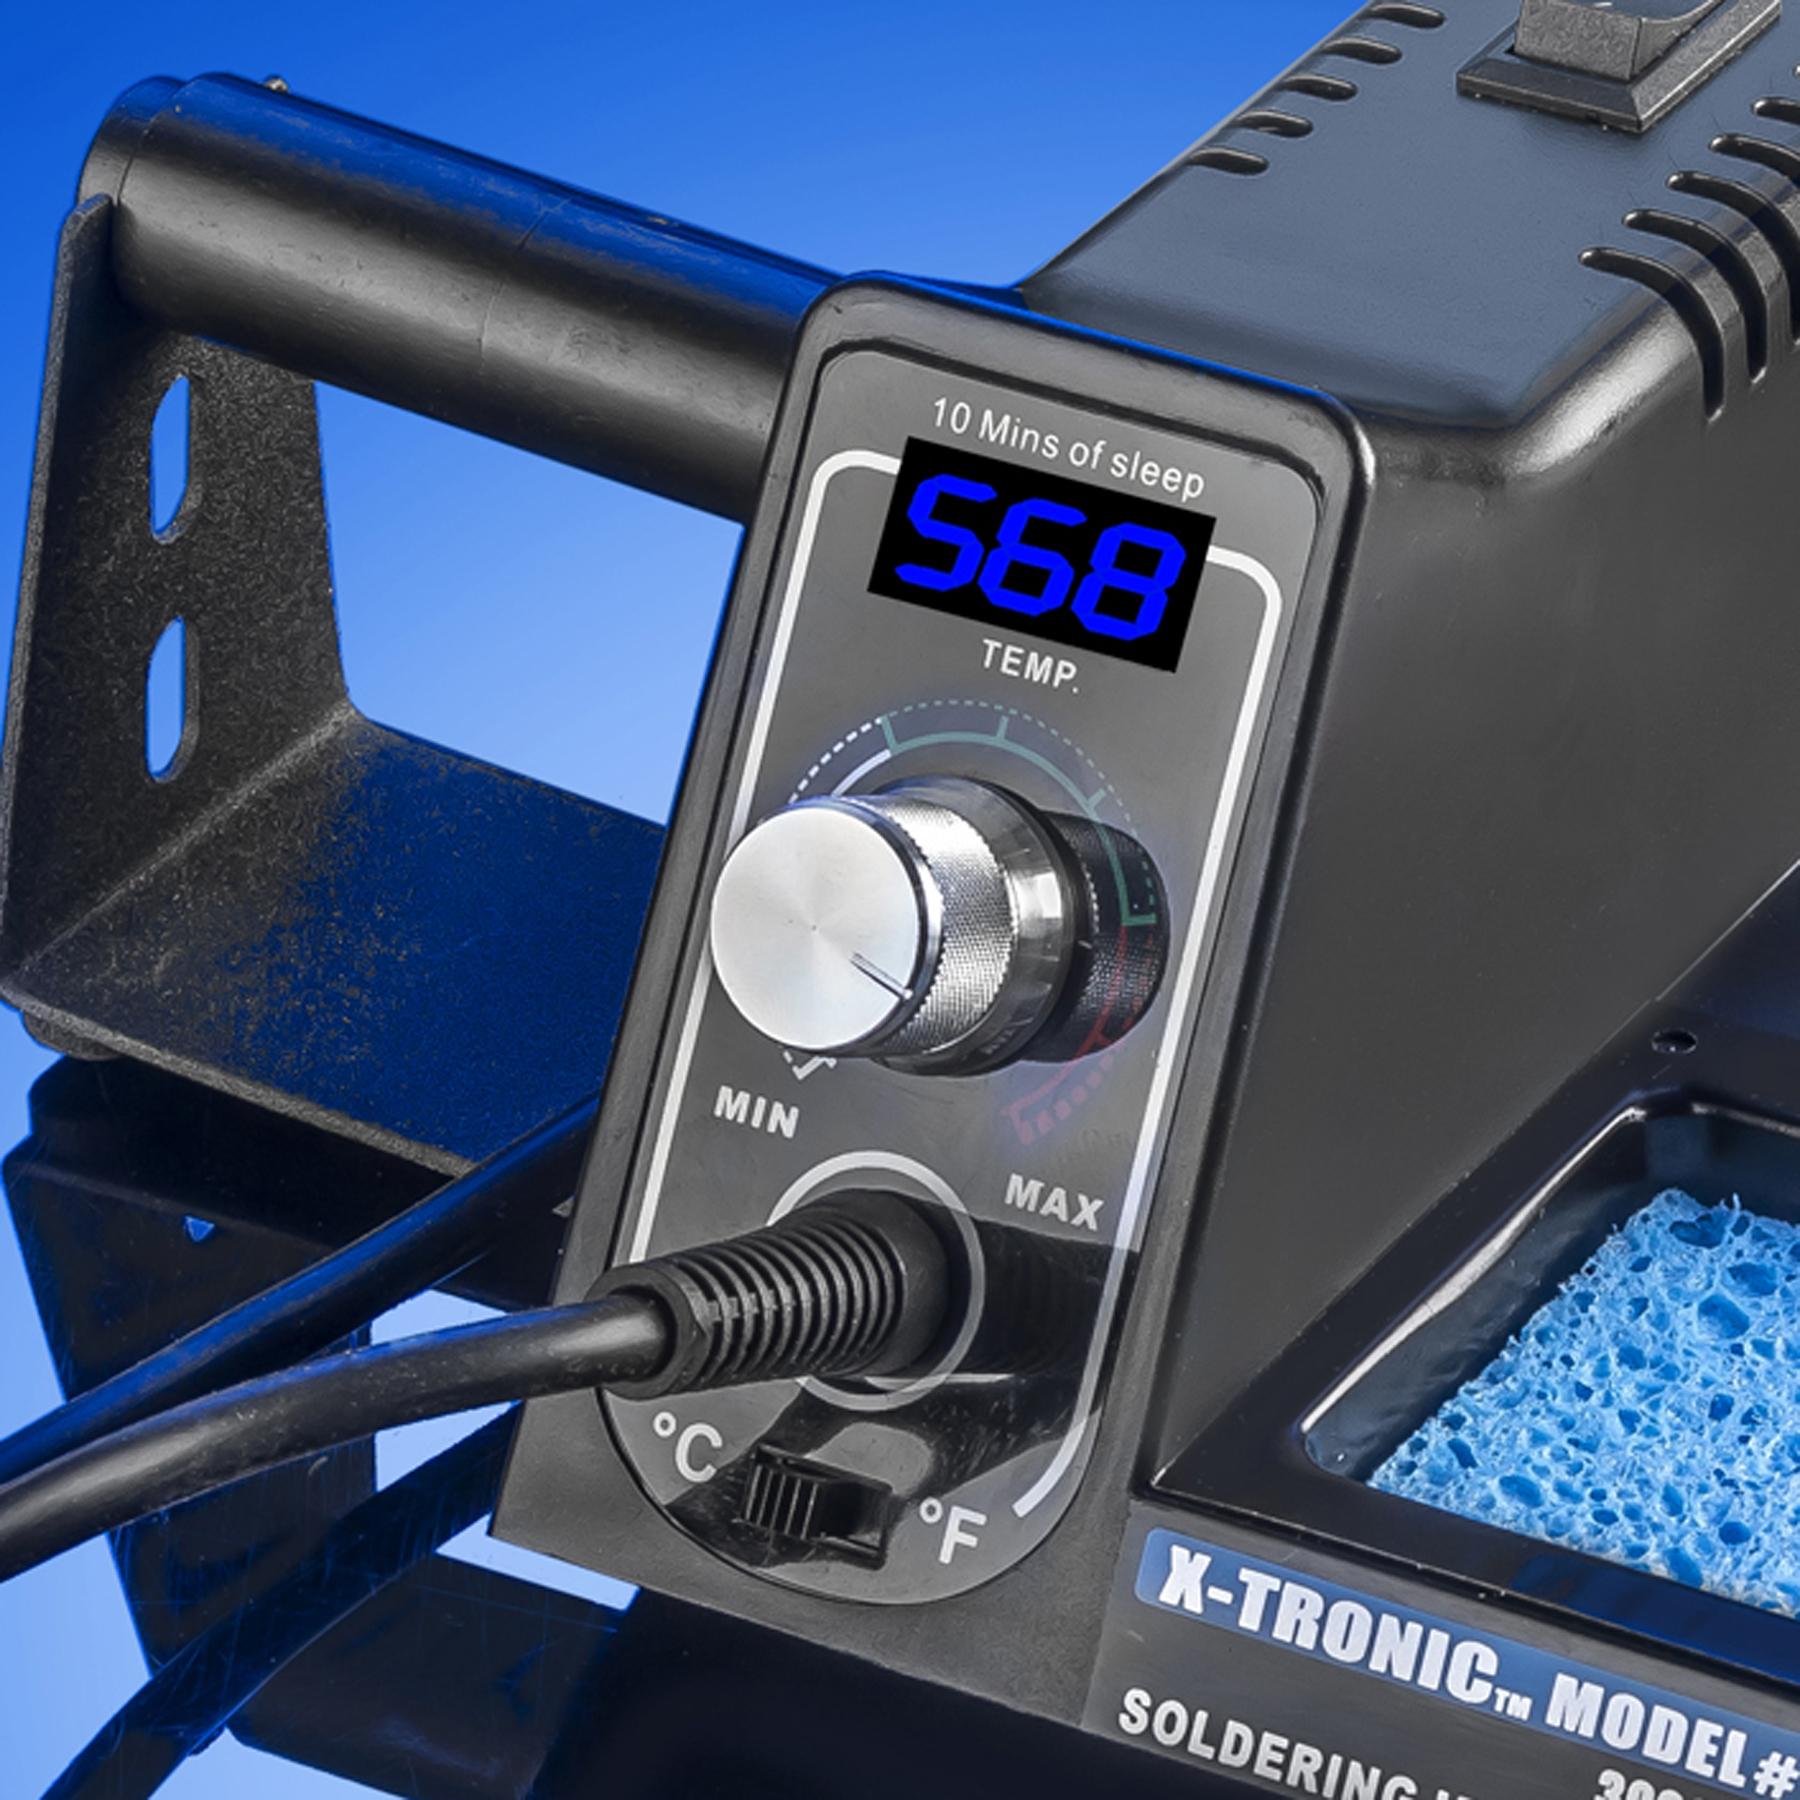 X-Tronic - Model 3020-XTS LED Display Soldering Station